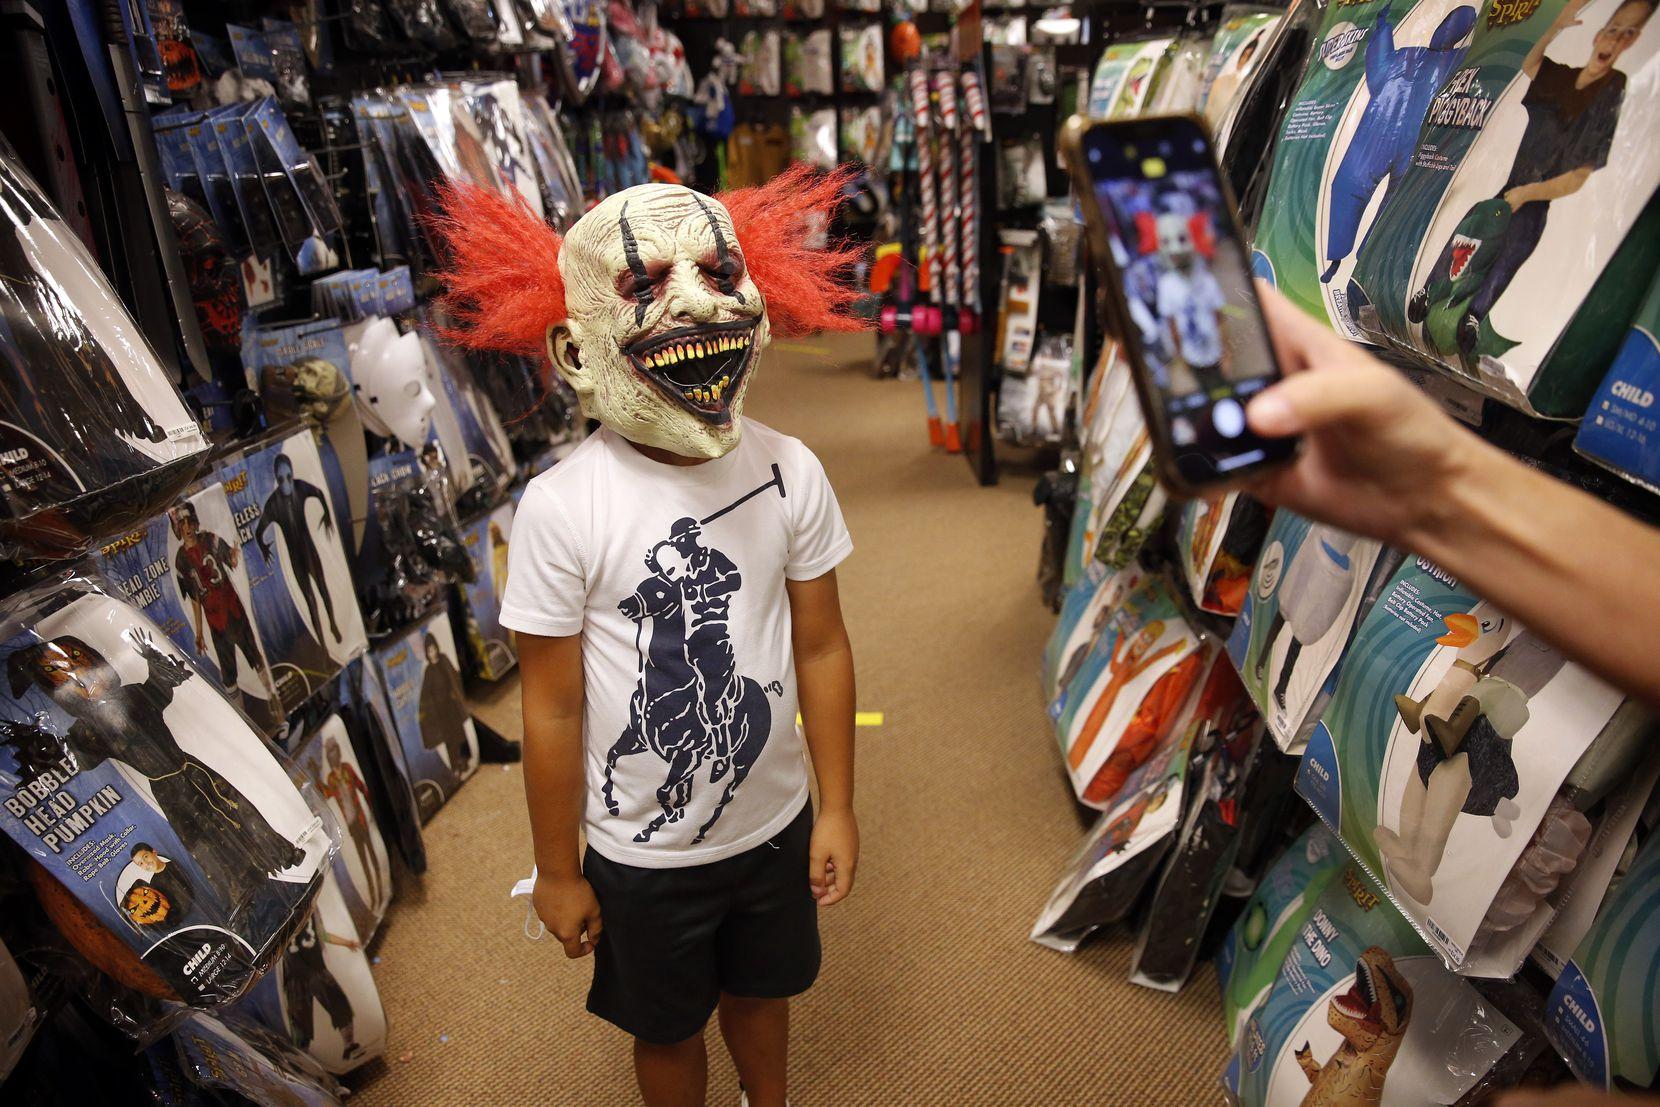 Carey Marin of Richardson takes a photo of her son, Joshua, wearing a clown mask at Spirit Halloween.